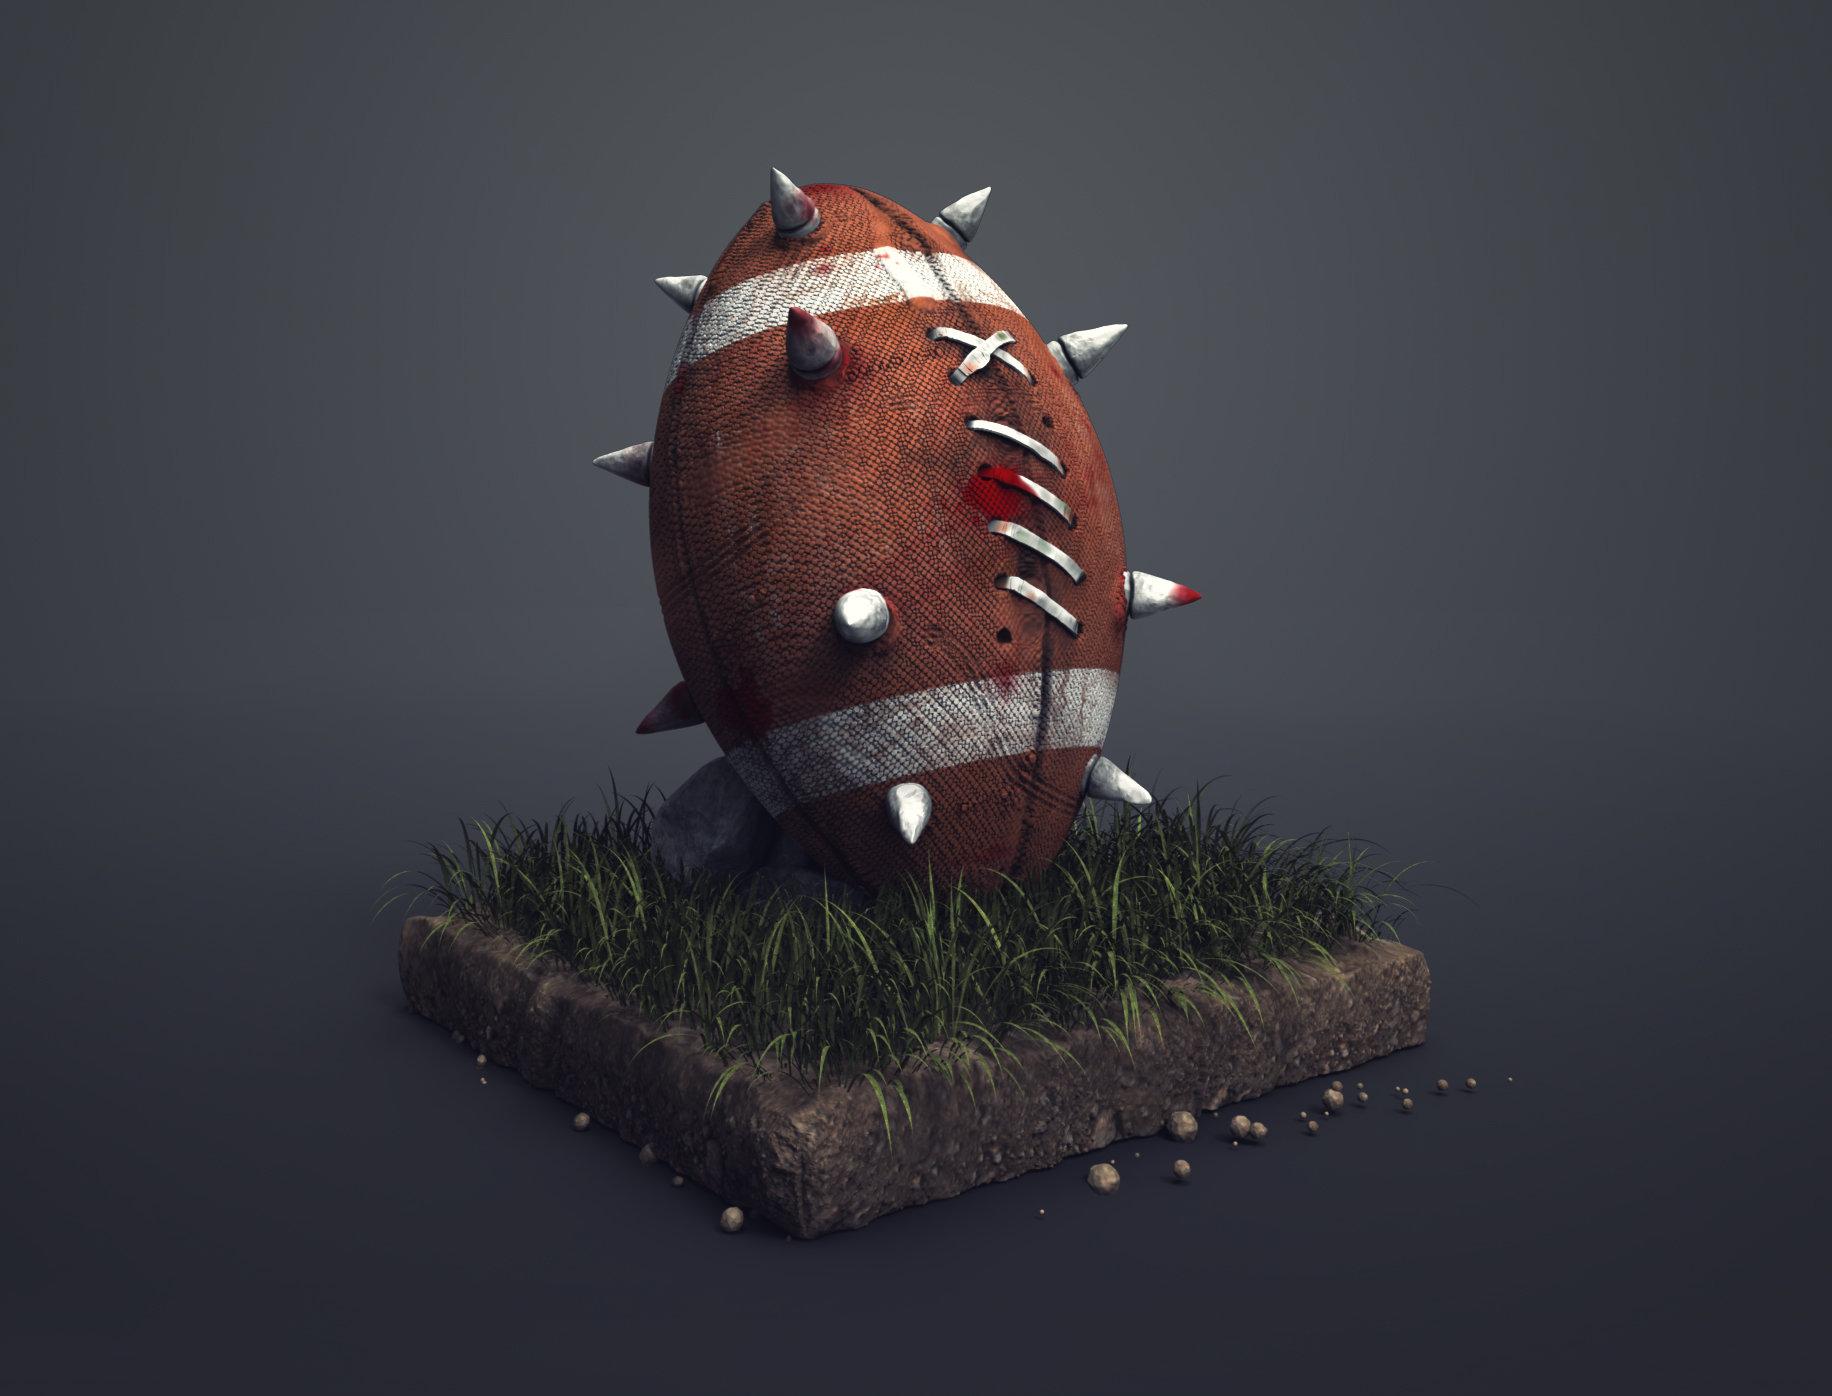 Ry cloze normalball